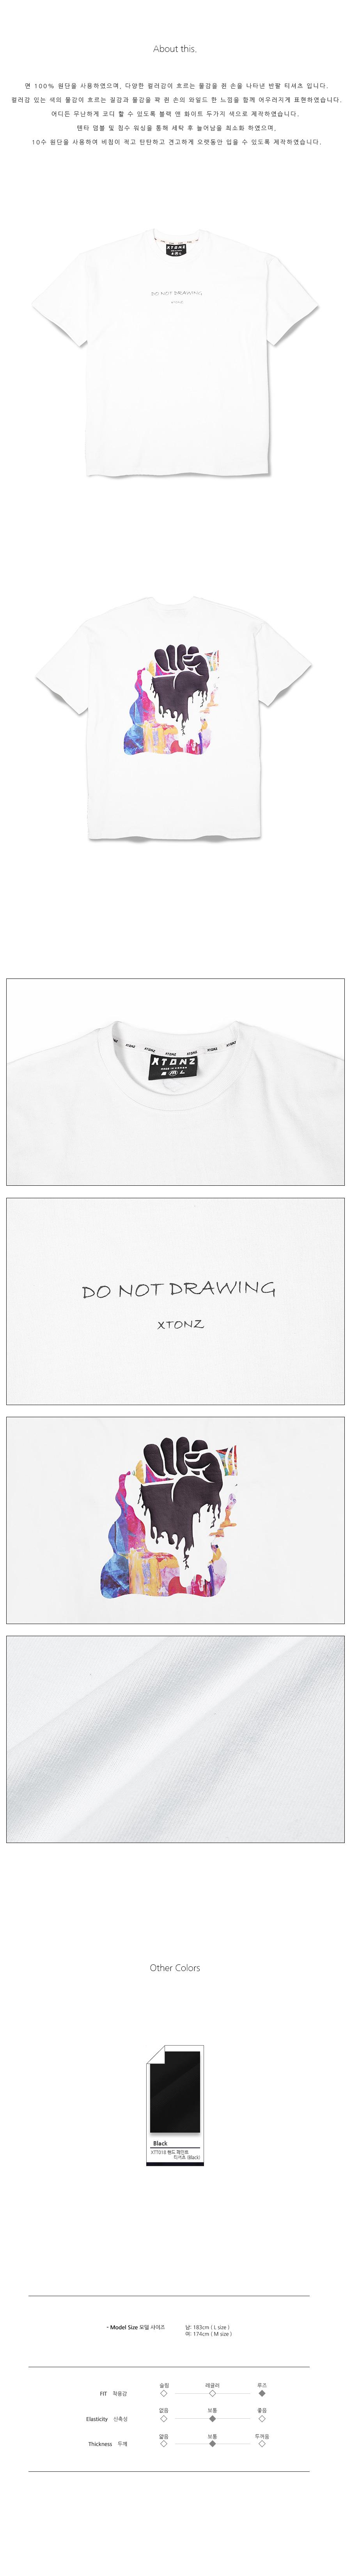 XTT018 핸드 페인트 반팔 티셔츠 (WHITE)